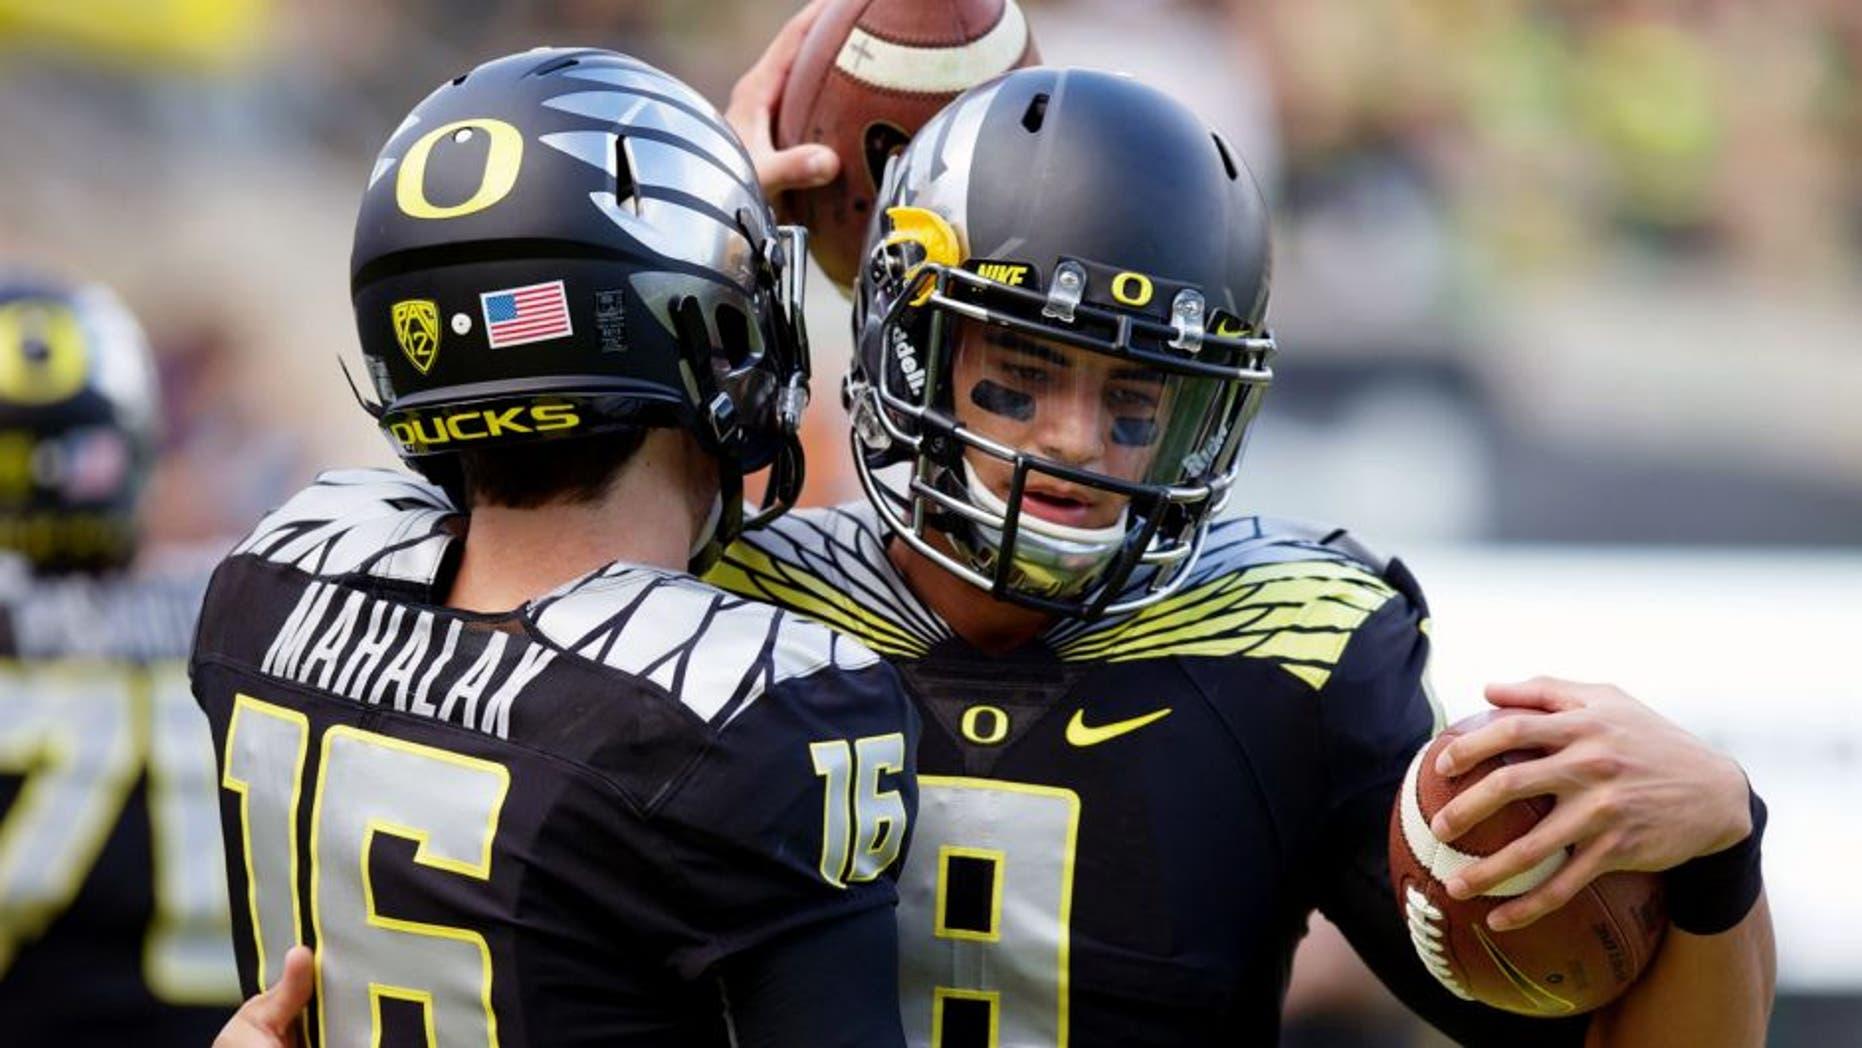 Nov 1, 2014; Eugene, OR, USA; Oregon Ducks quarterback Morgan Mahalak (16) and quarterback Marcus Mariota (8) talk before the game against the Stanford Cardinal at Autzen Stadium. Mandatory Credit: Scott Olmos-USA TODAY Sports